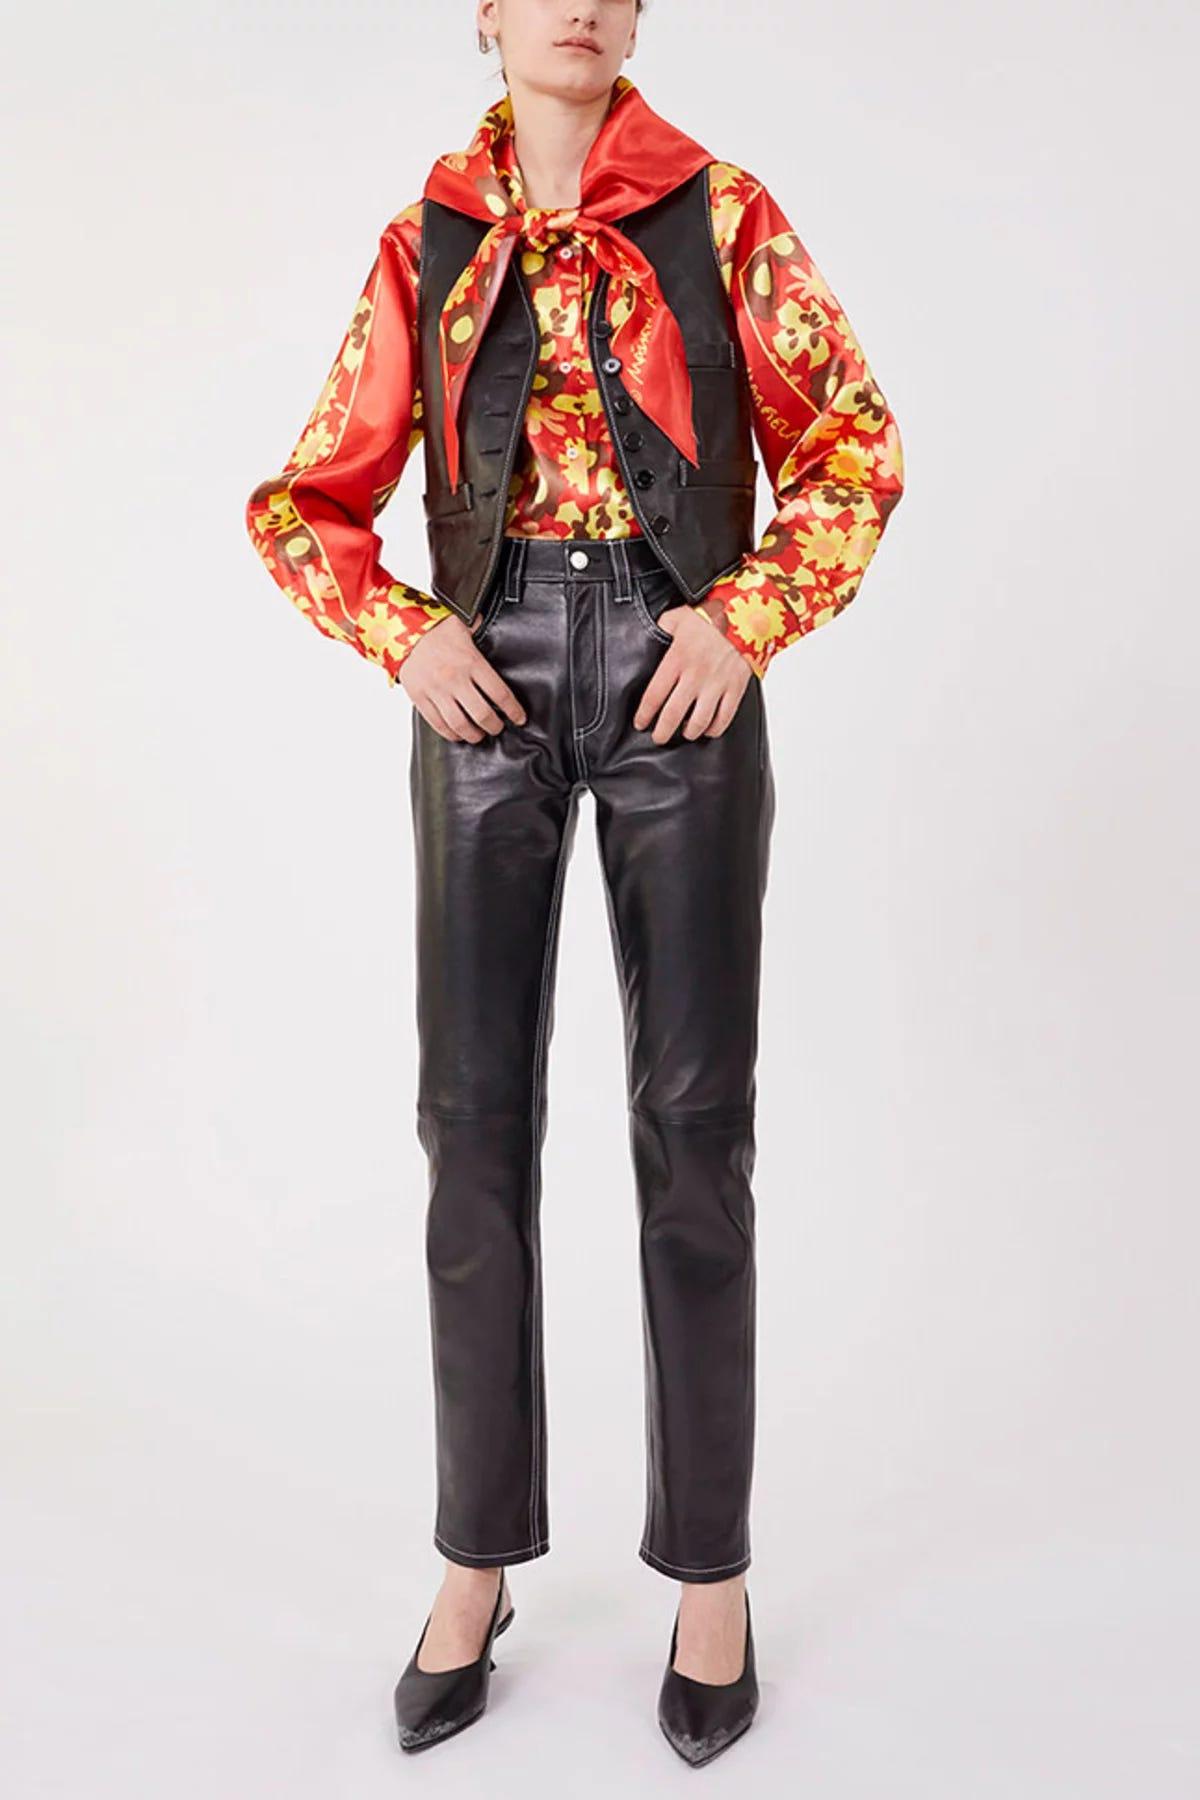 f49e298b4bd74 Leather Pants Trend Spring 2019, Vegan & Genuine Option